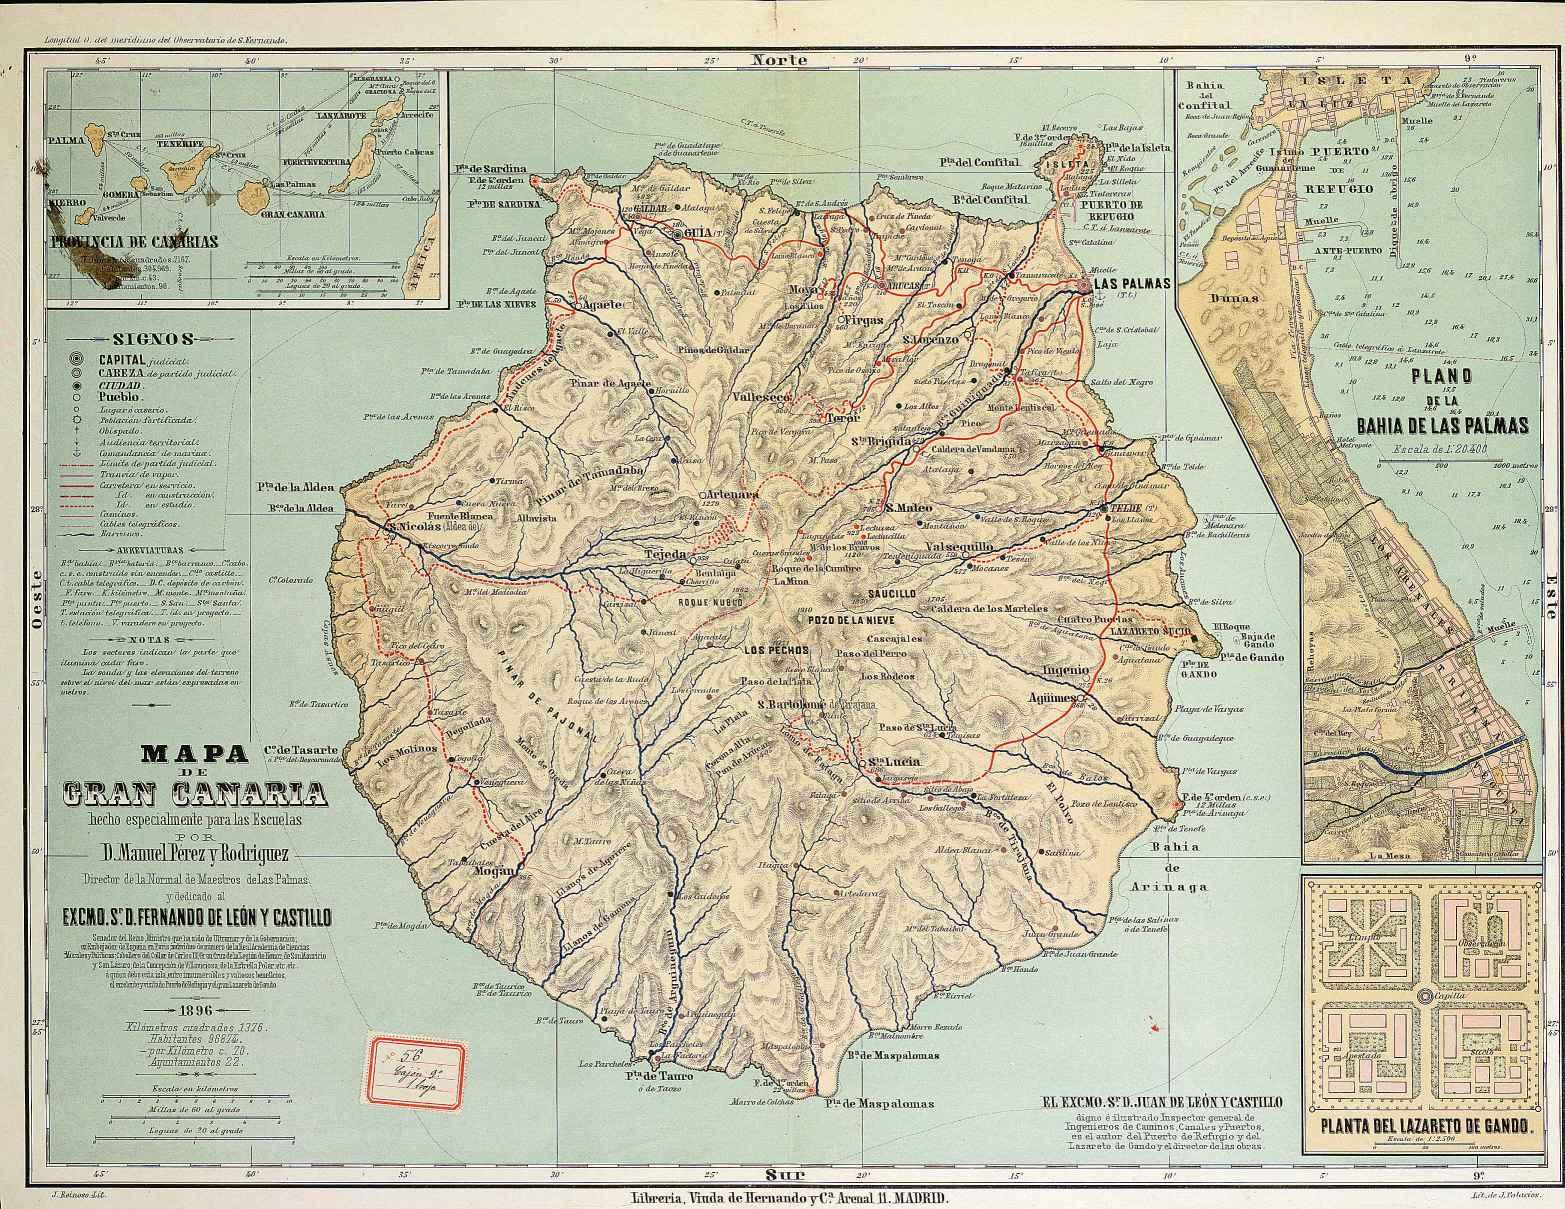 Gran Canaria map 1896